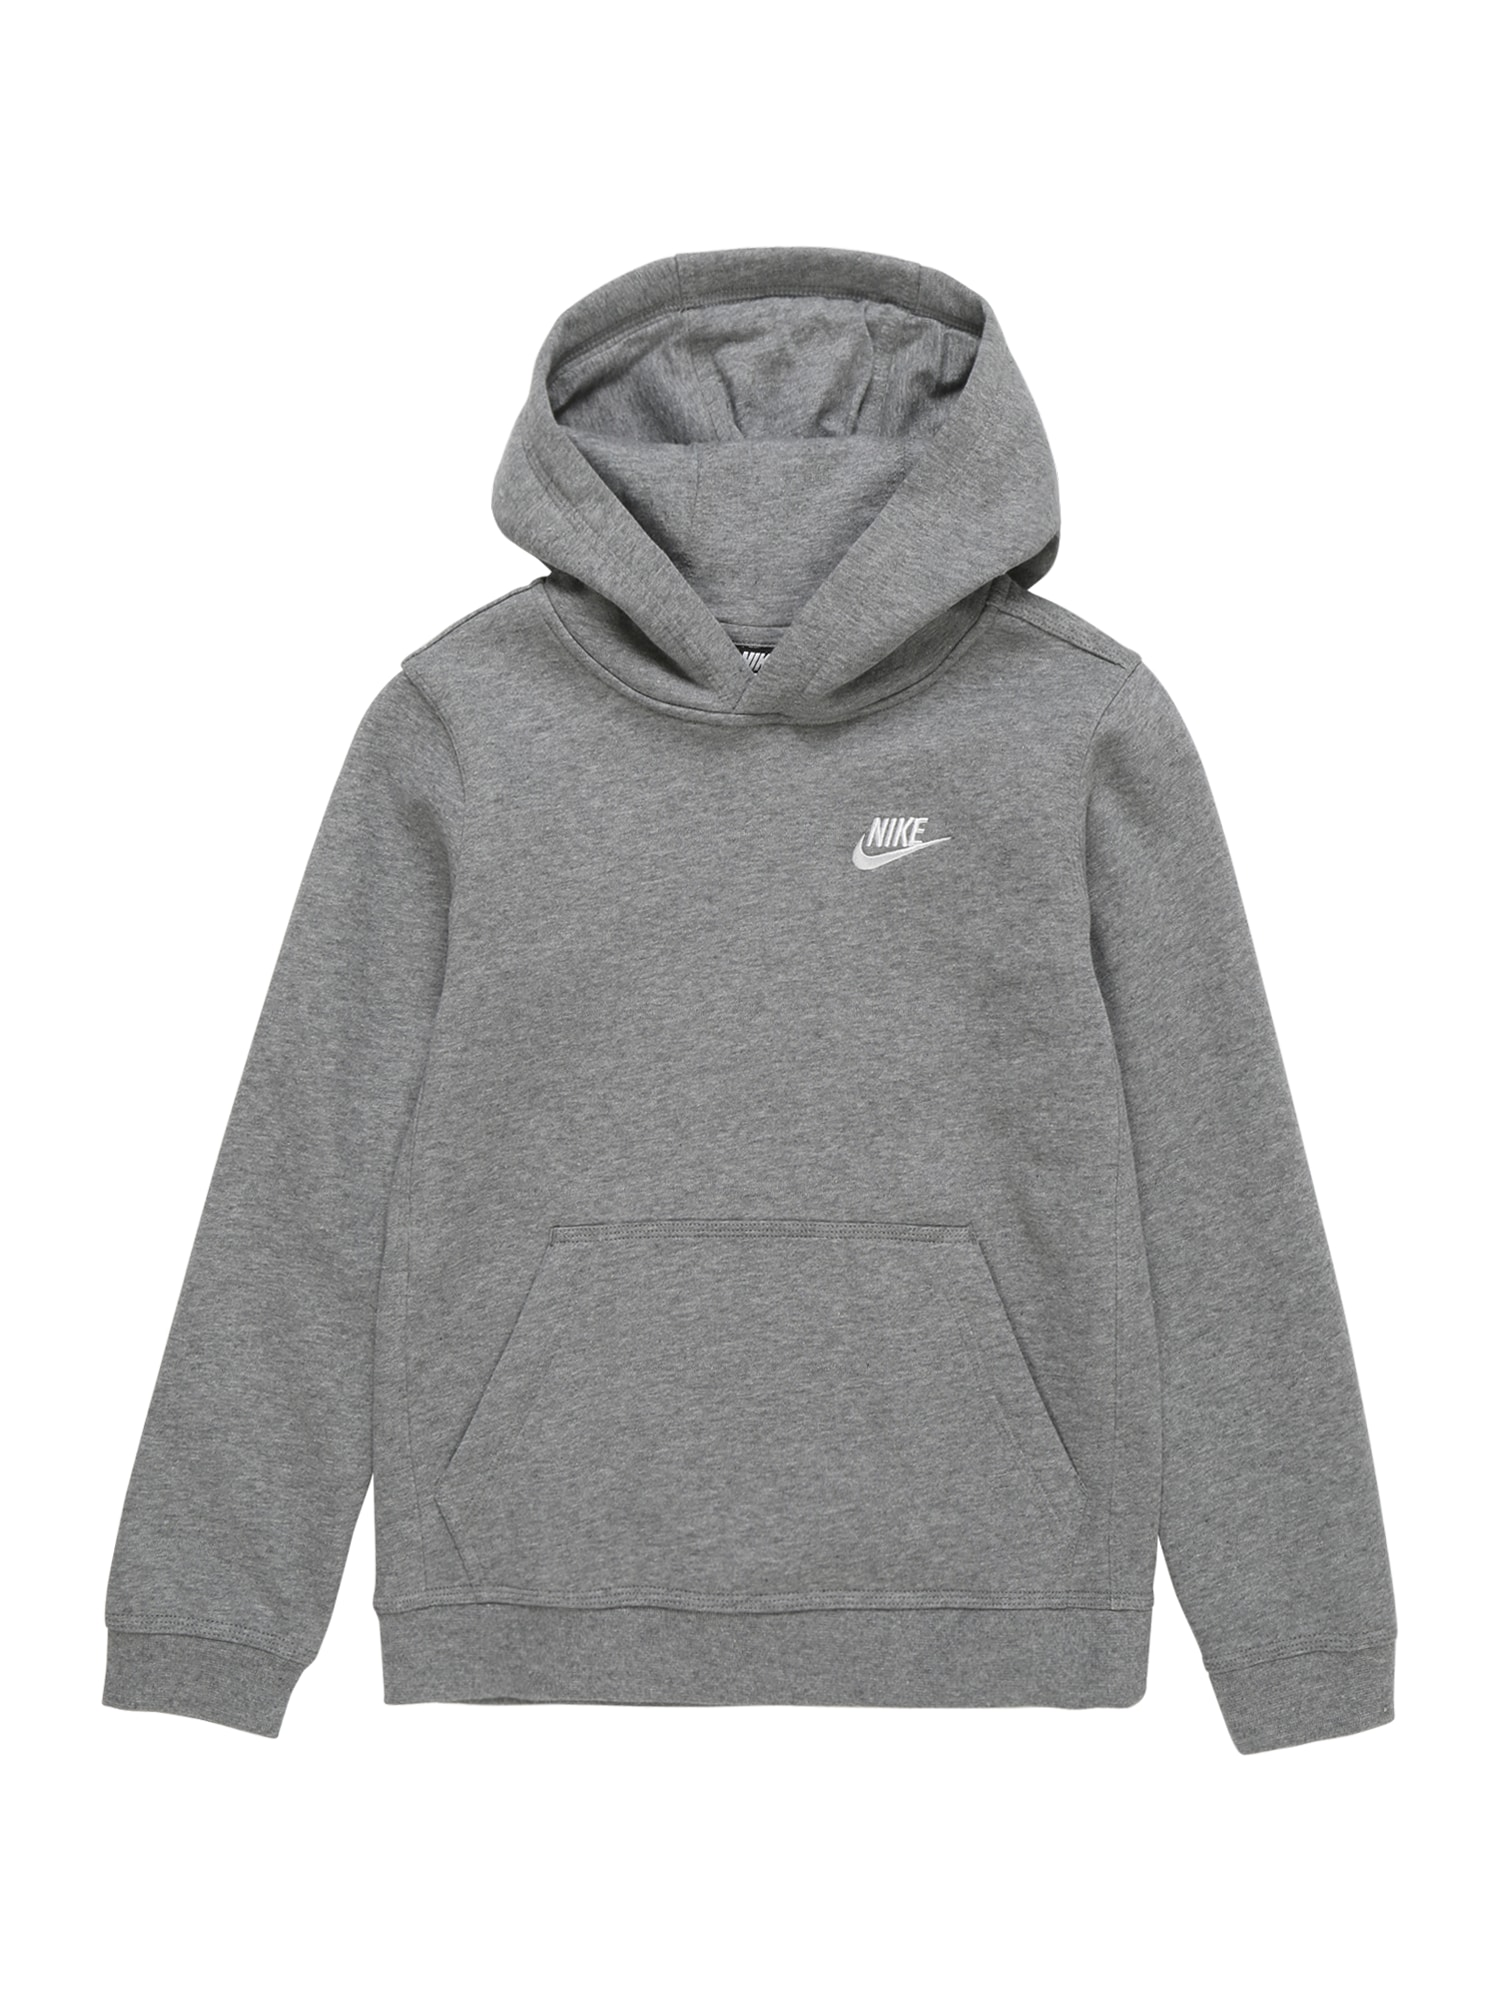 Nike Sportswear Megztinis be užsegimo balta / pilka